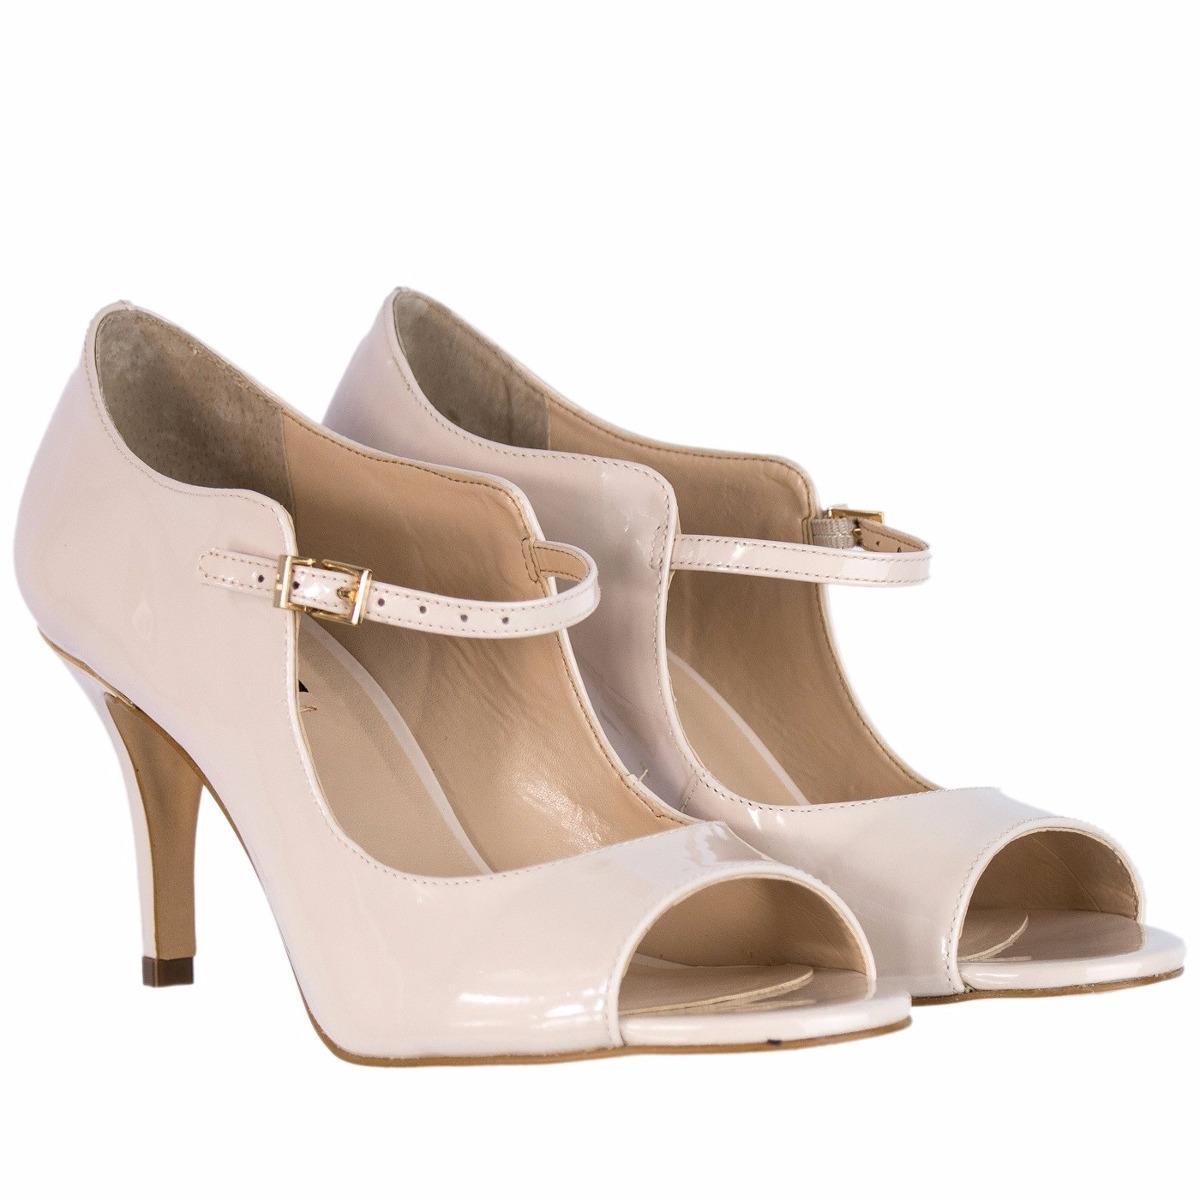 c88c7a8671 sapato peep toe feminino jorge bischoff verniz salto médio. Carregando zoom.